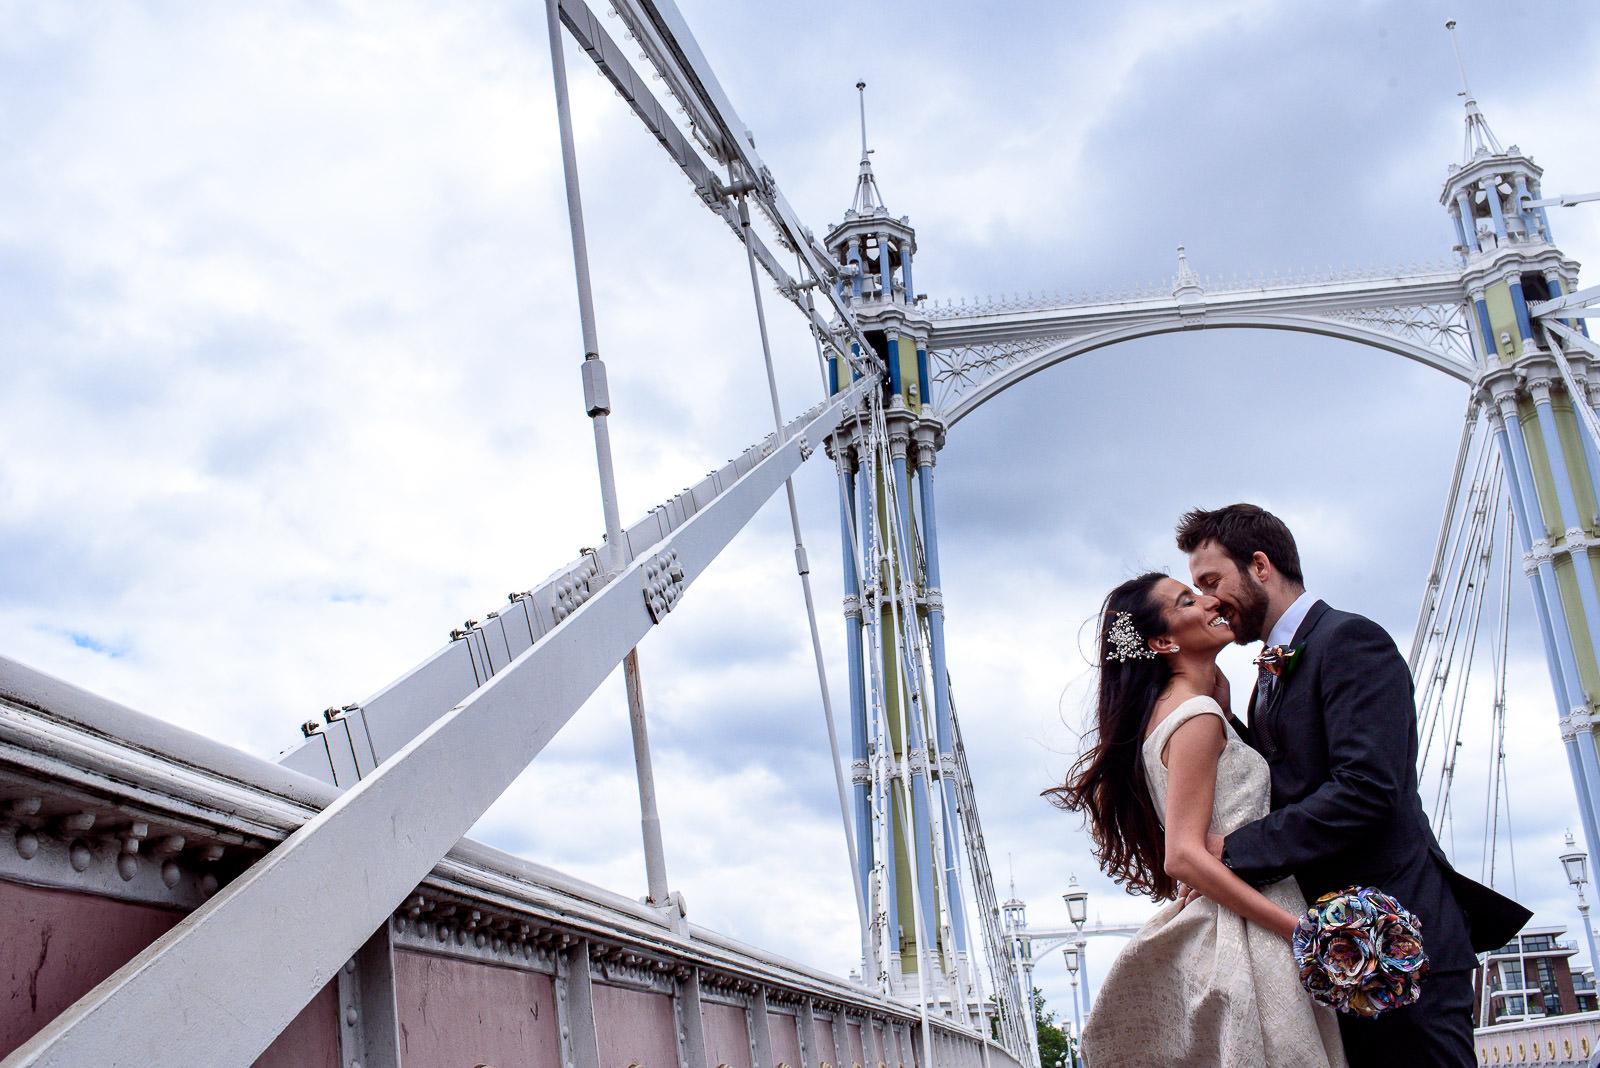 Wedding couple photo shoot on Albert Bridge in London